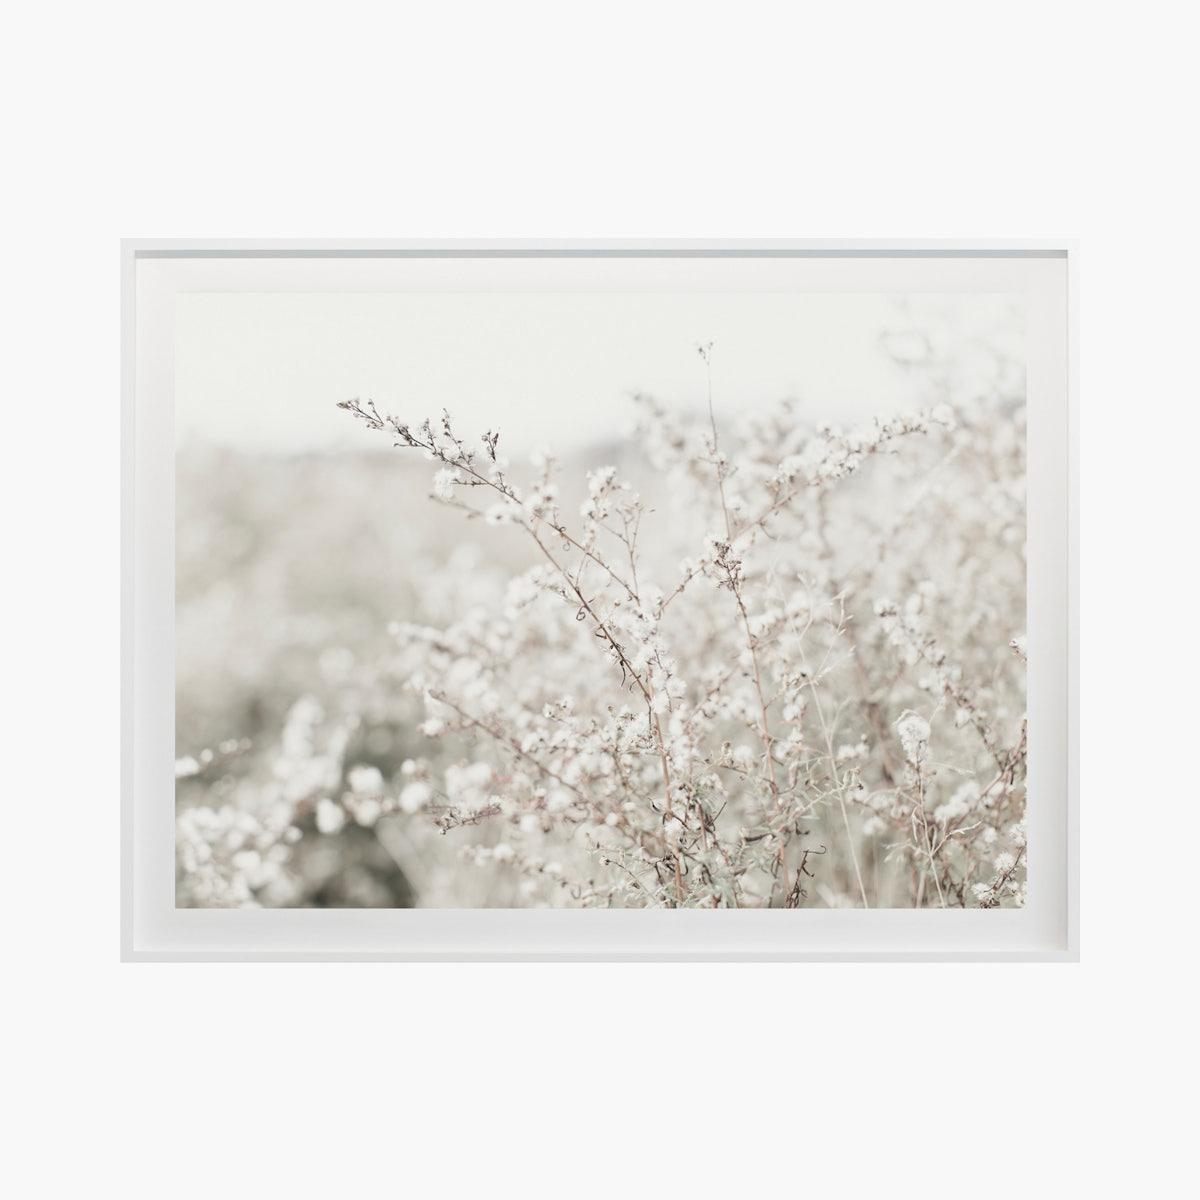 """Fields + Flora No. 5662"" by Cas Friese"